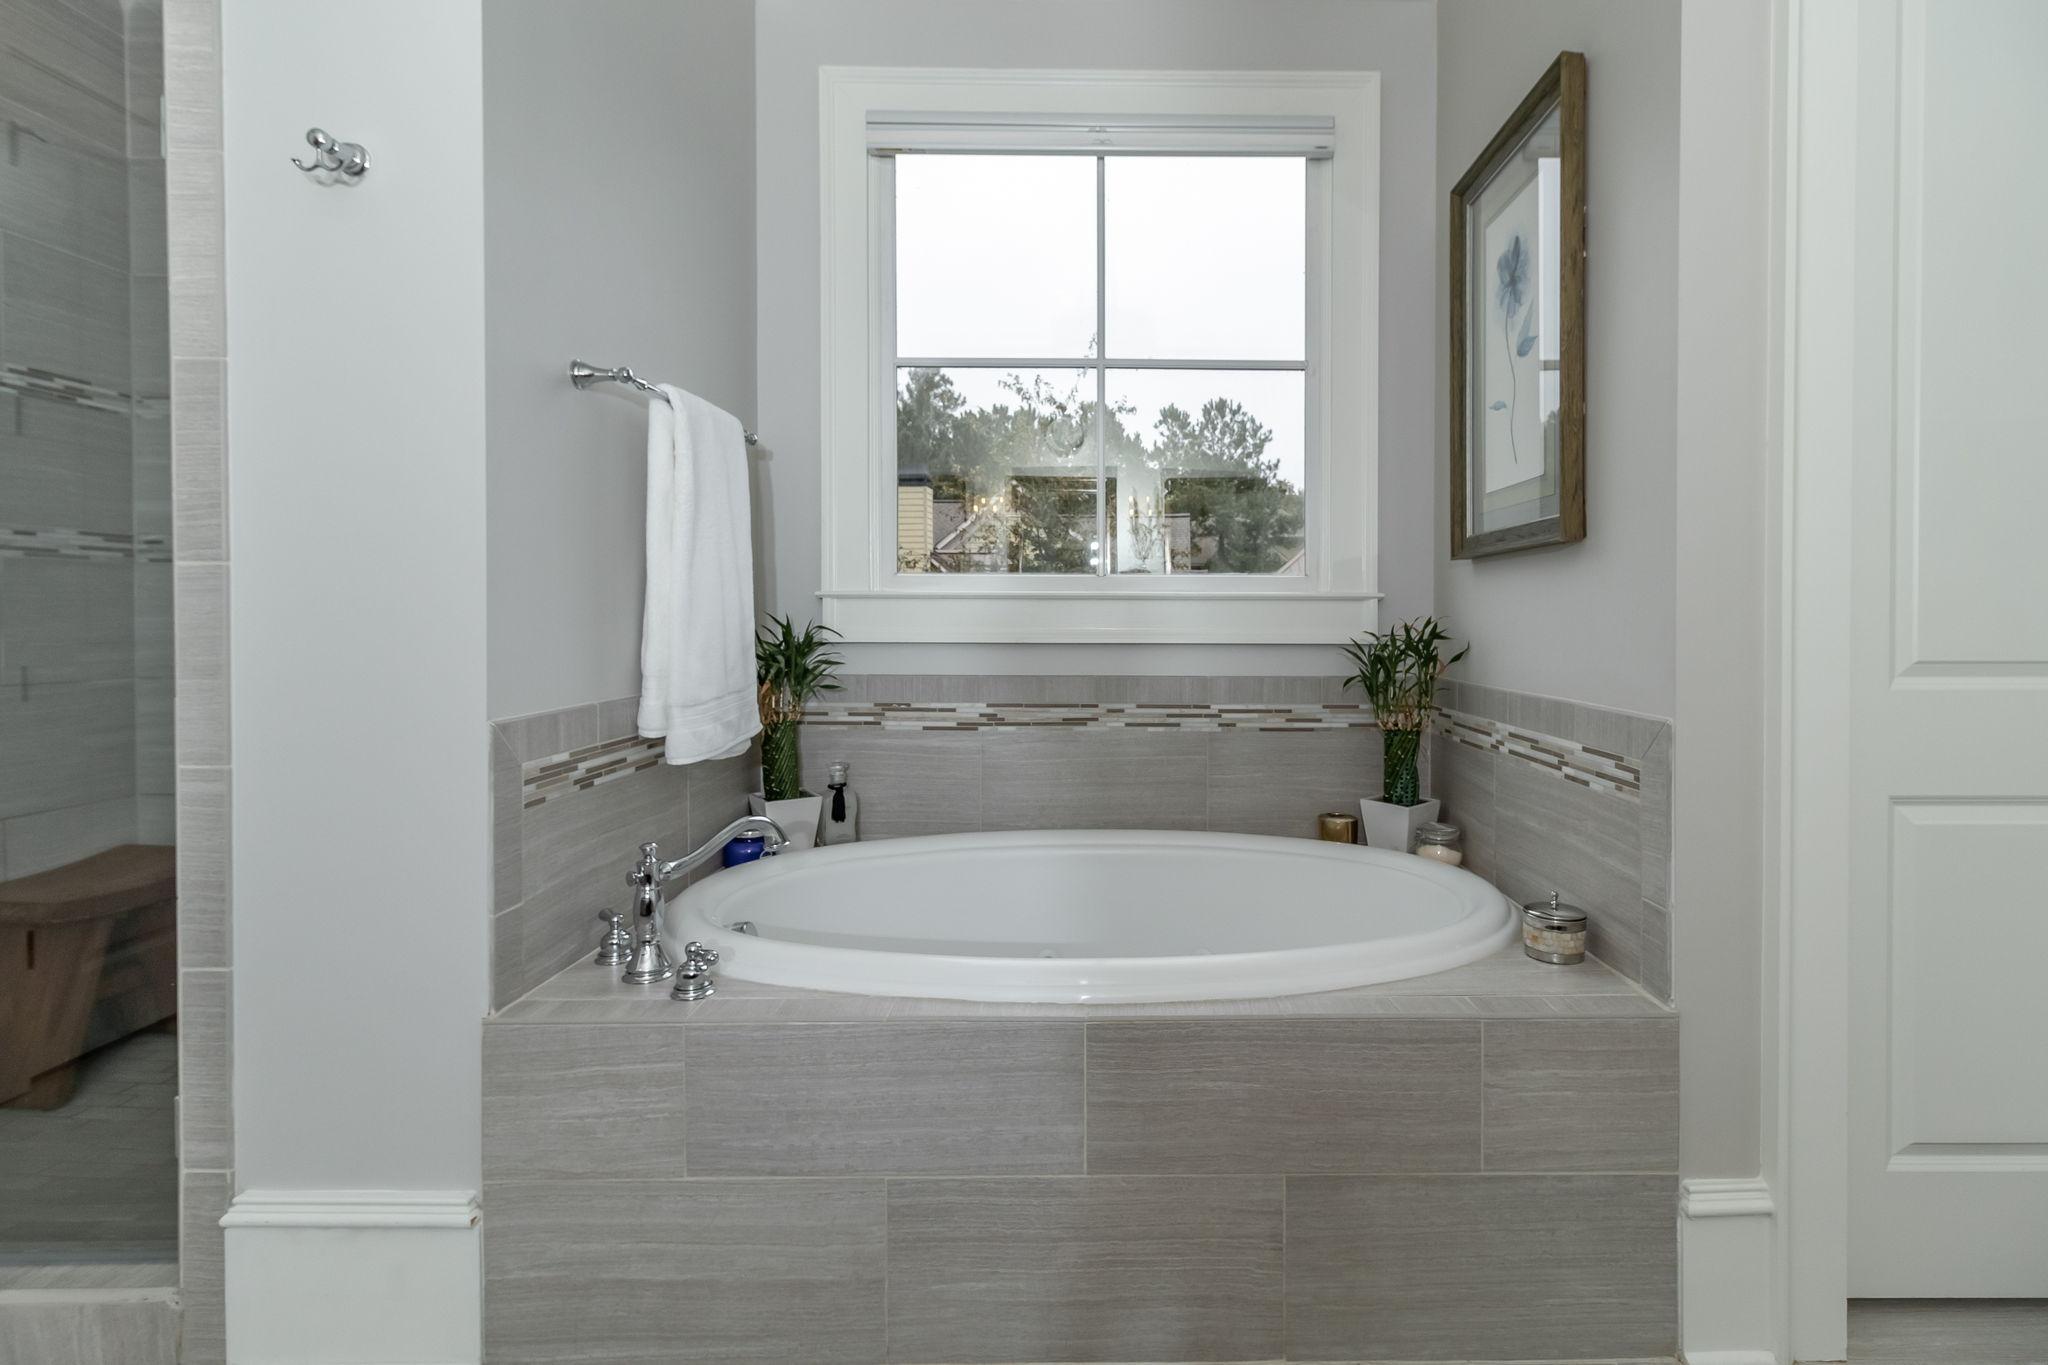 Owner's EnSuite Bath - Soaker Tub